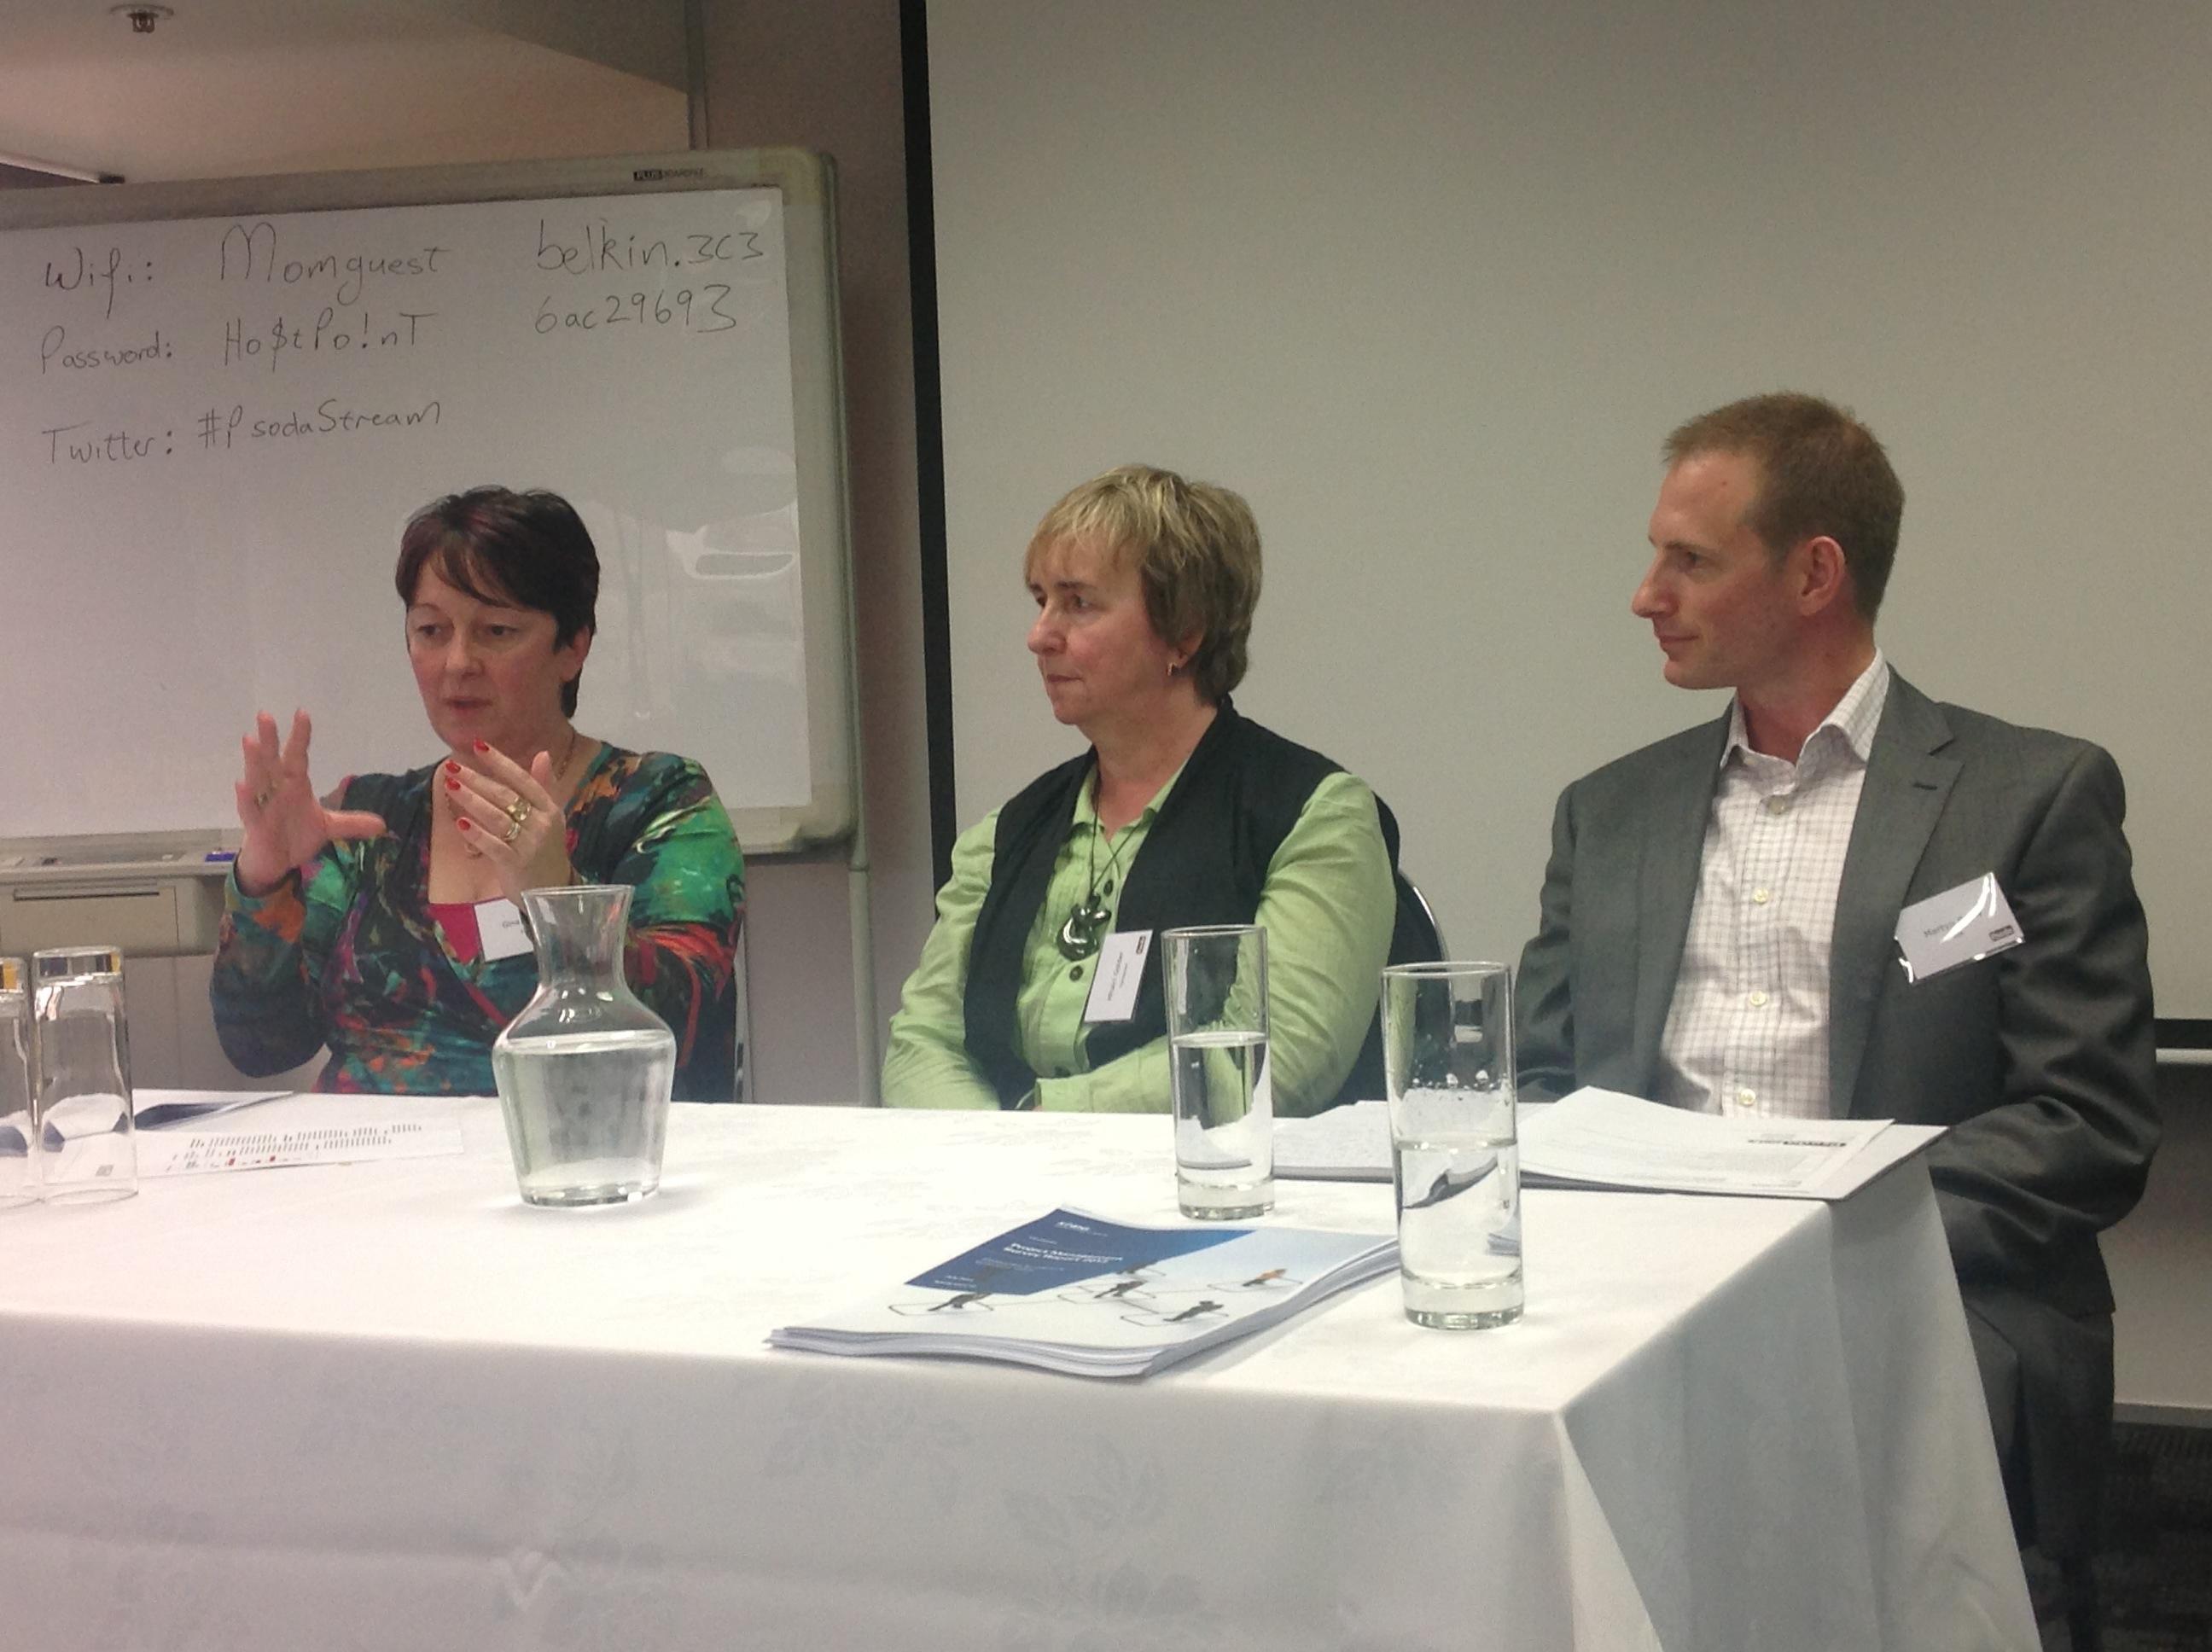 PPM and PMOs: Gina Barlow, Mhairi Golder & Steve Scrivener